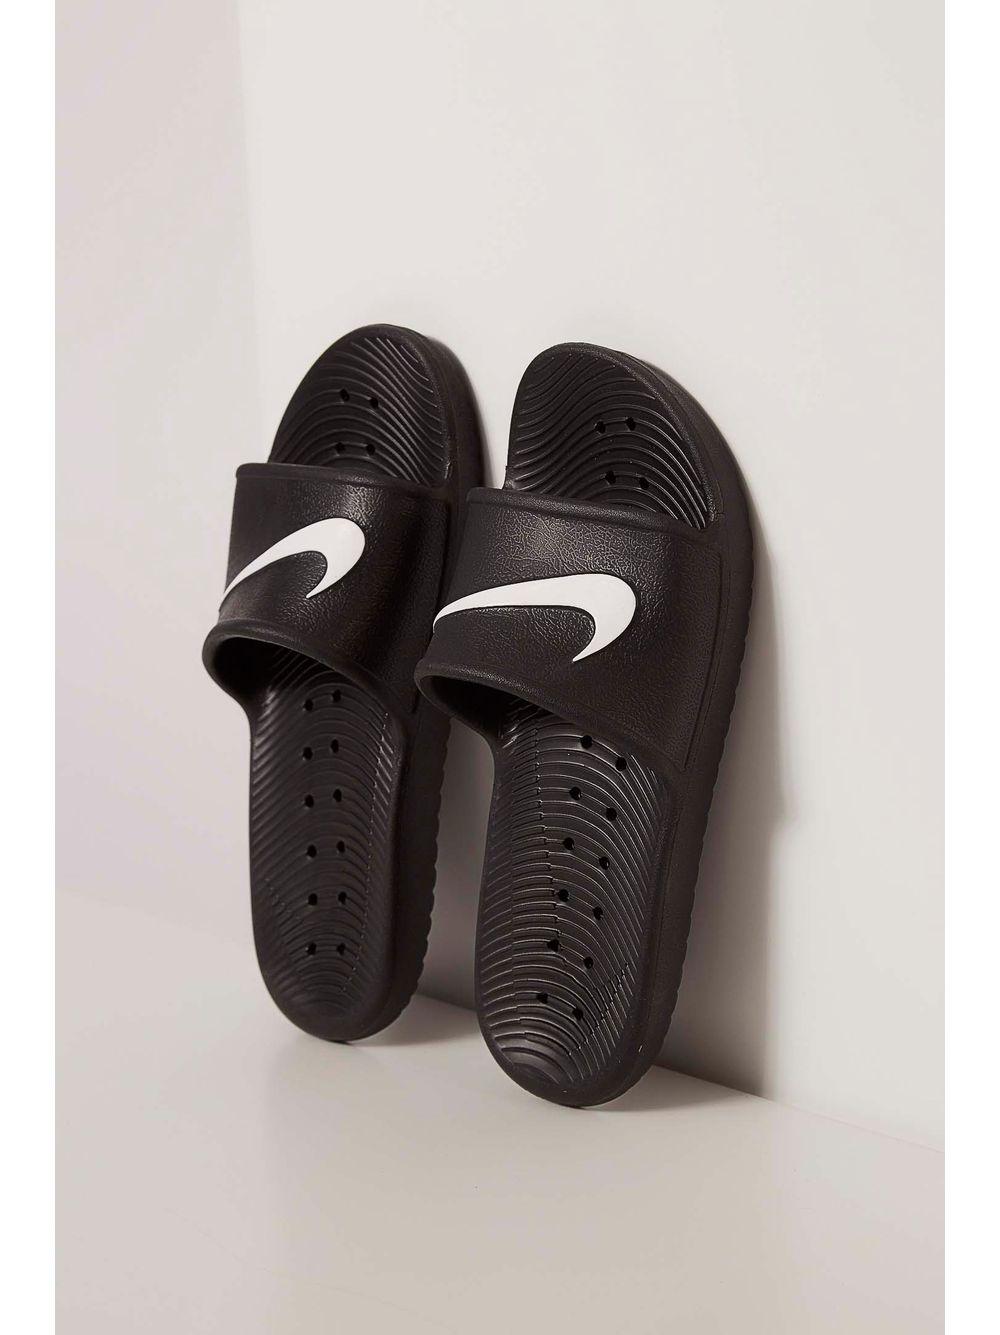 a5b1871d94a32 Chinelo Slide Nike Kawa Shower Preto - pittol